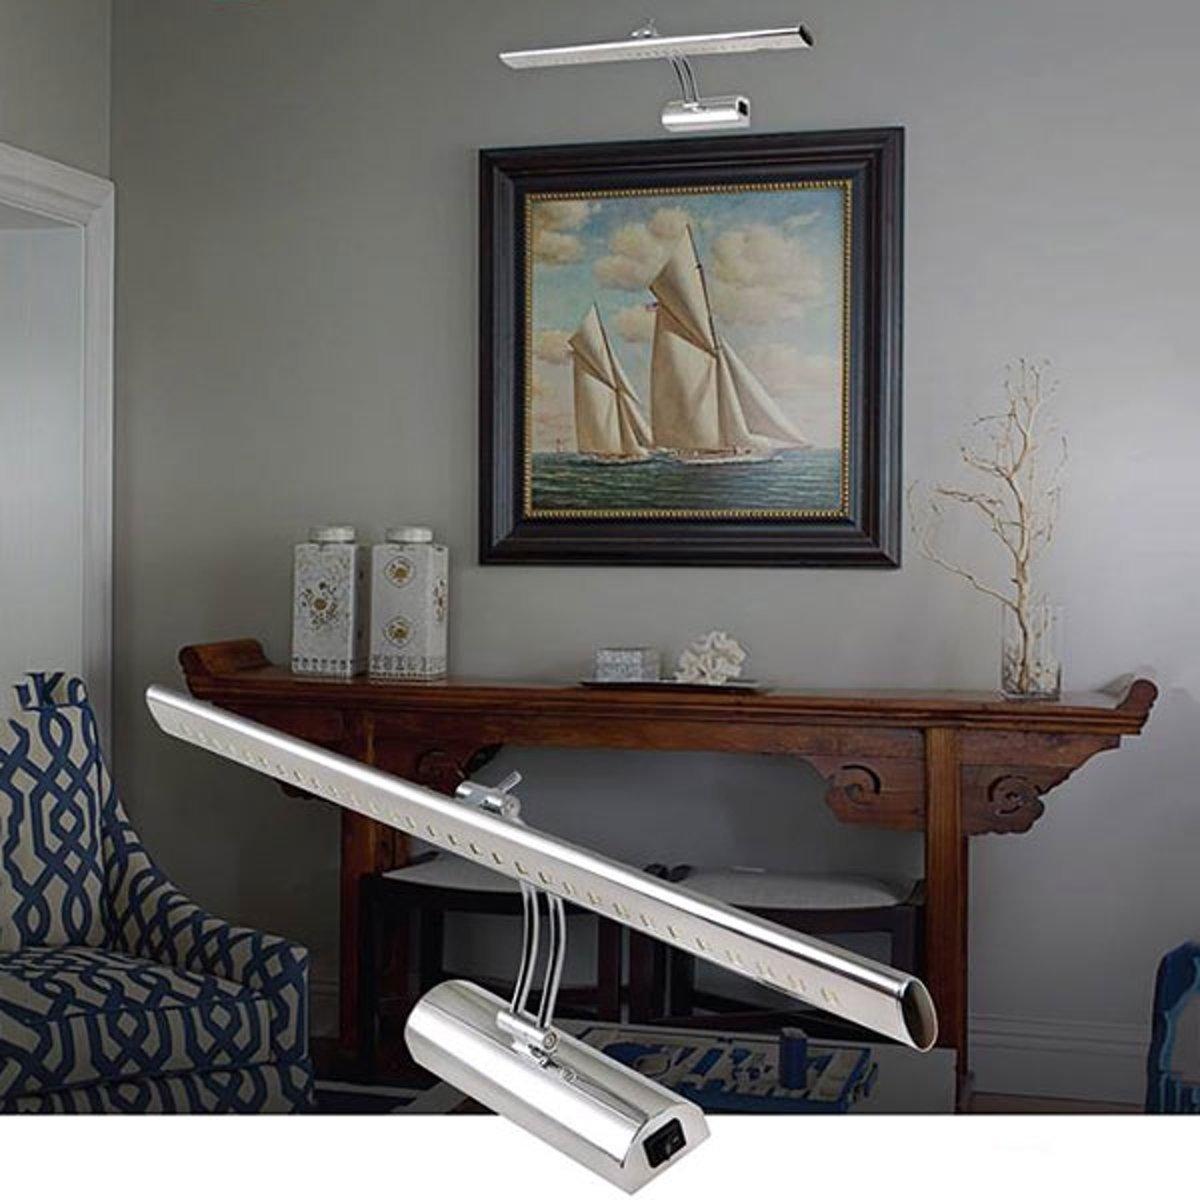 bol.com | LED Badkamer Wandlamp 6W 4200K Natuurlijk Wit Glans Chroom ...